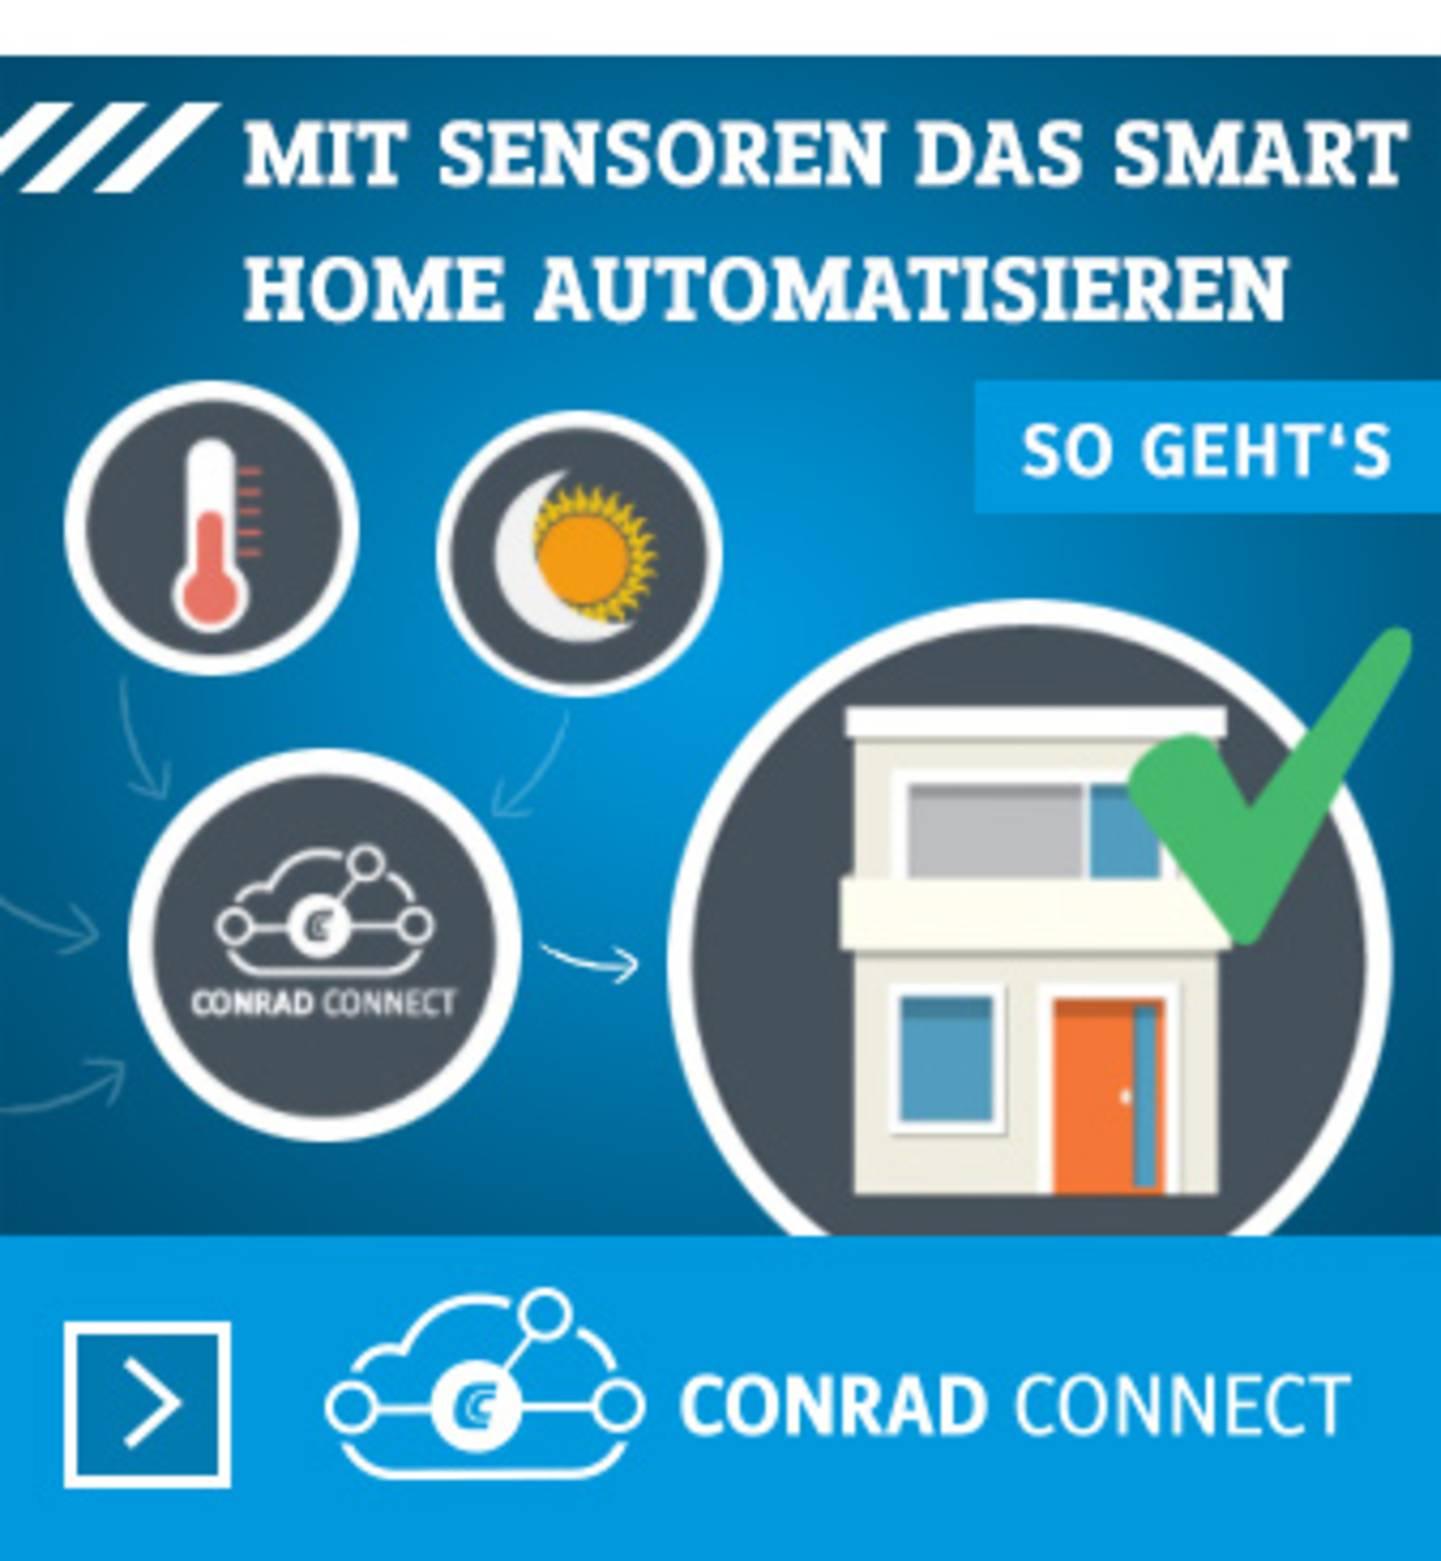 Smart Home - WLAN im ganzen Haus